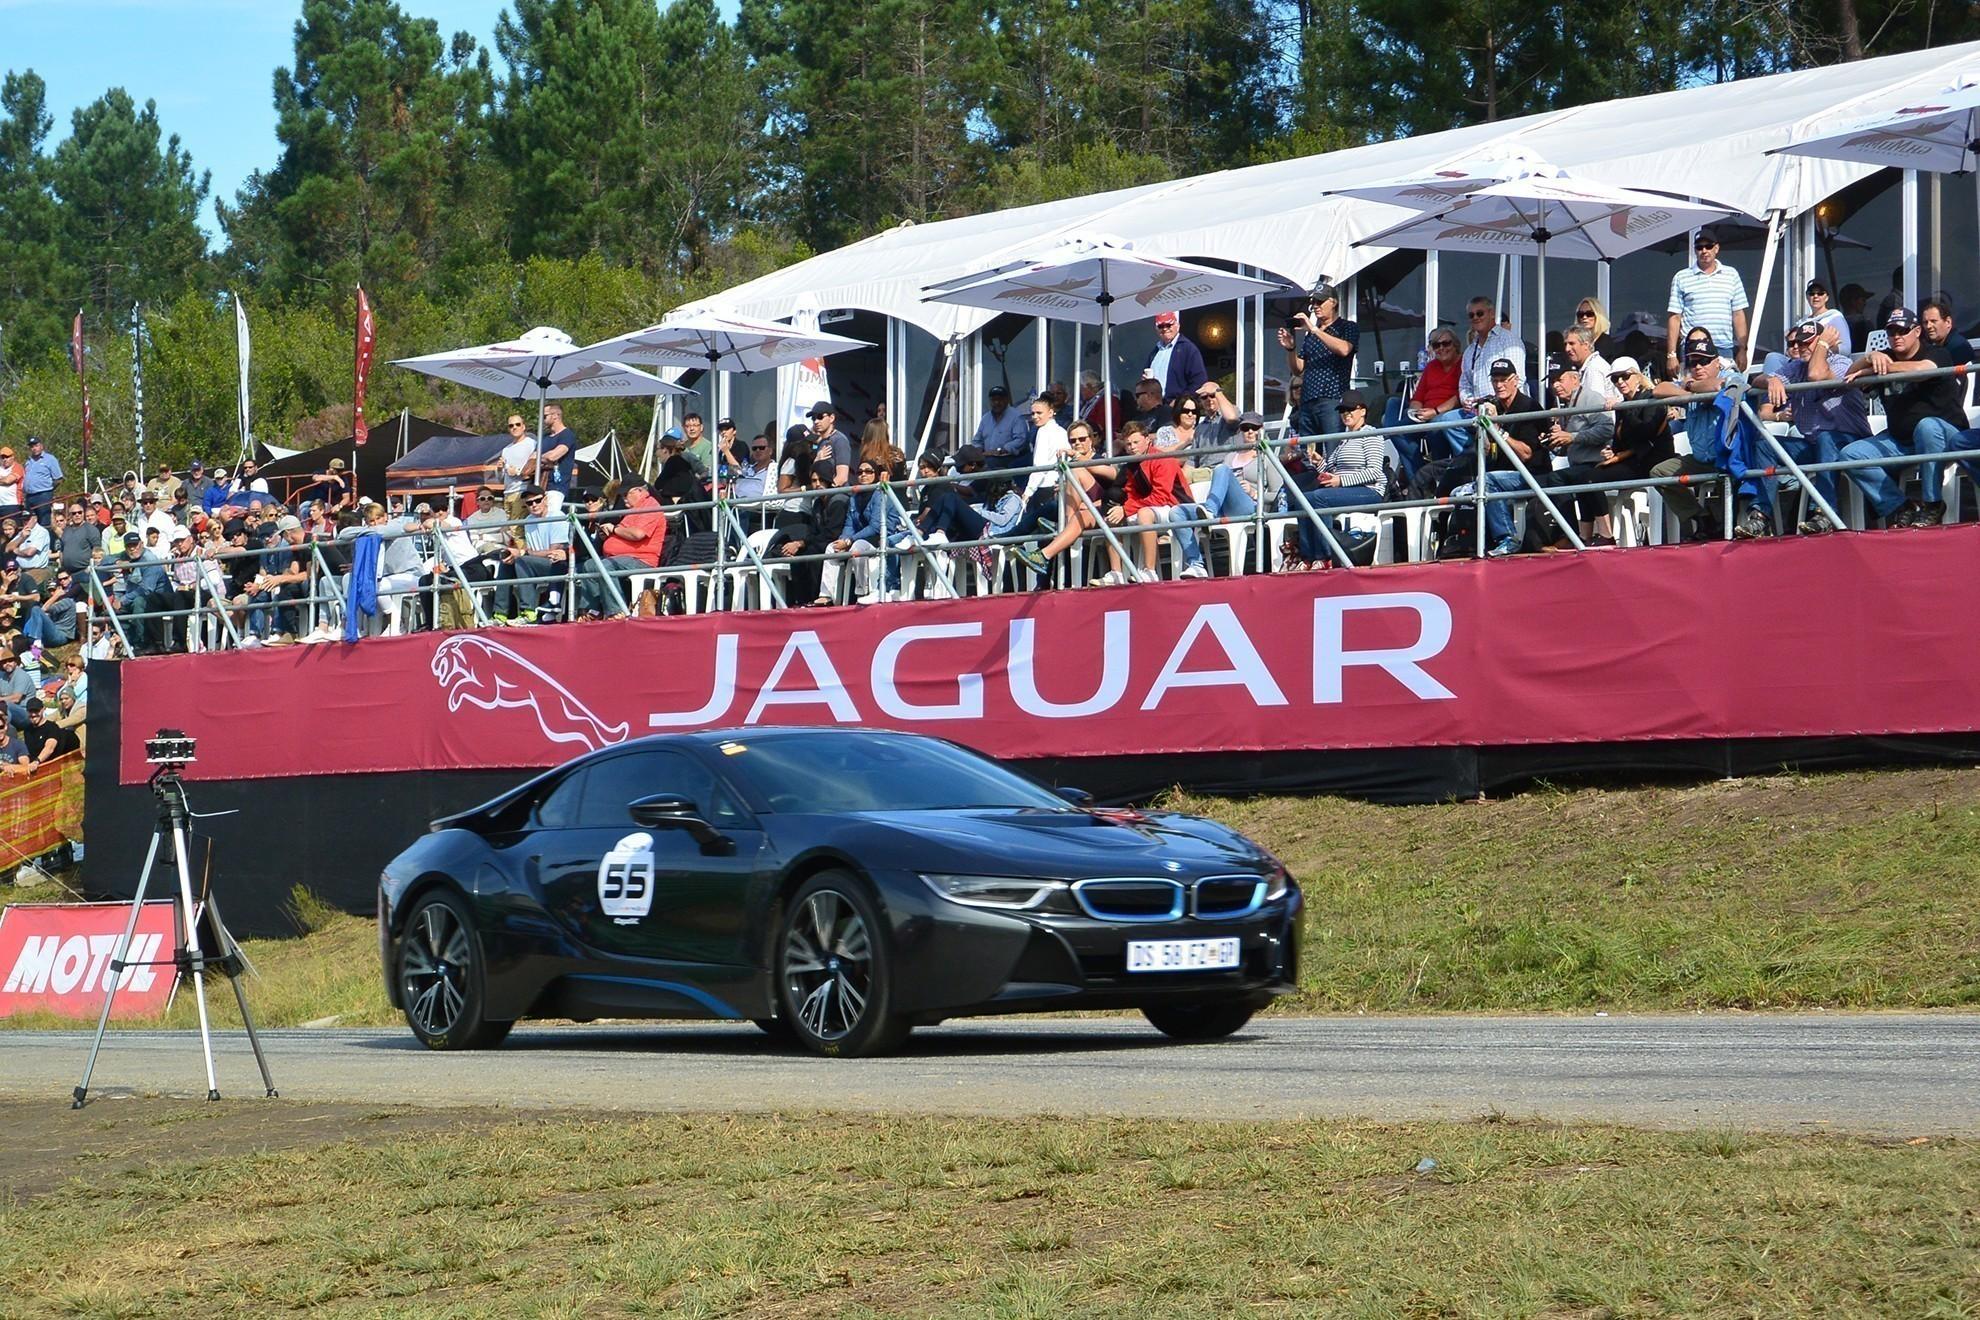 jaguar-simola-hillclimb-360-video